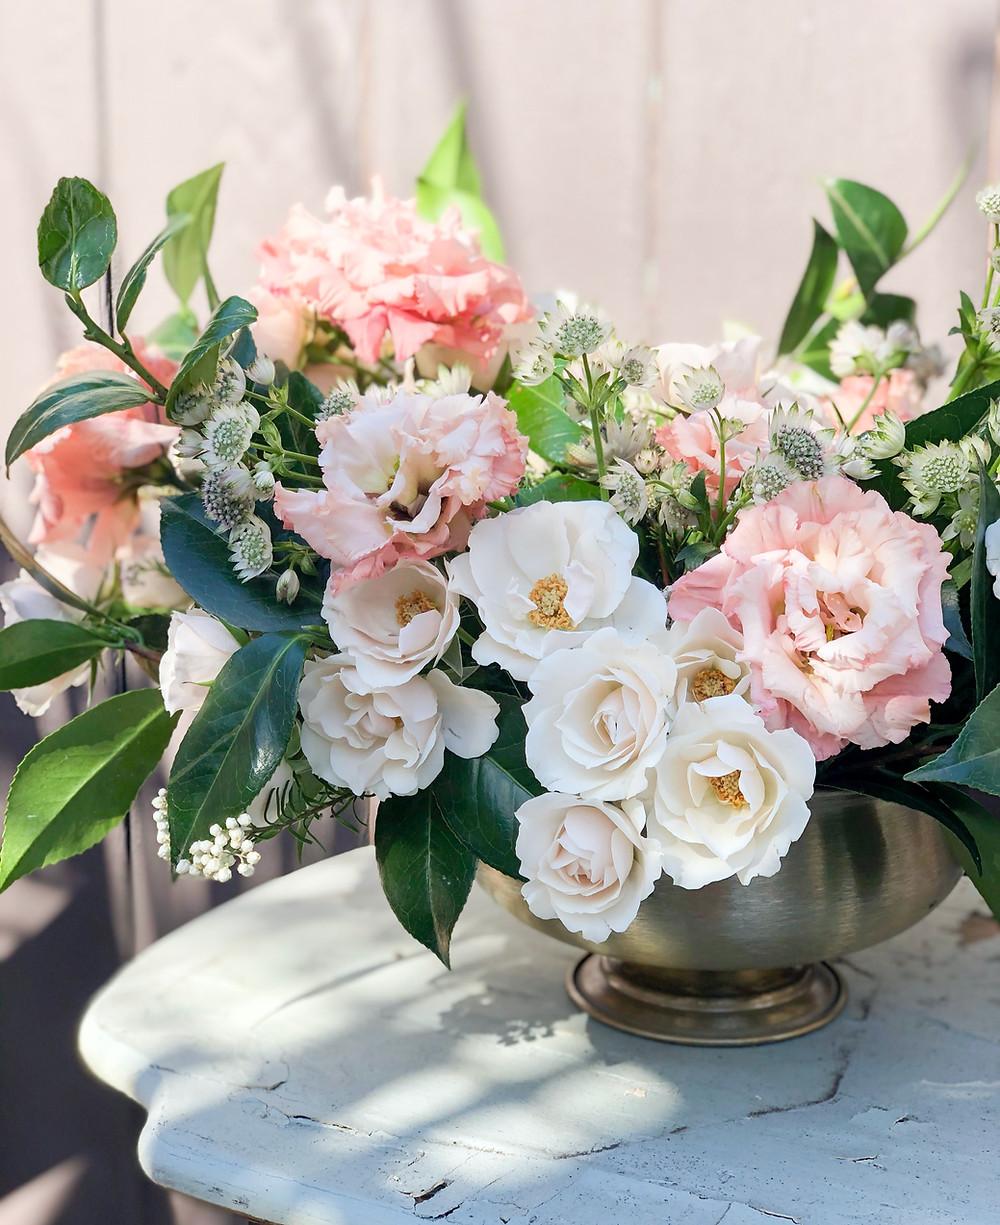 Blush wedding florals, garden style centerpiece, wedding flowers by San Diego Wedding Florist Le Champagne Projects